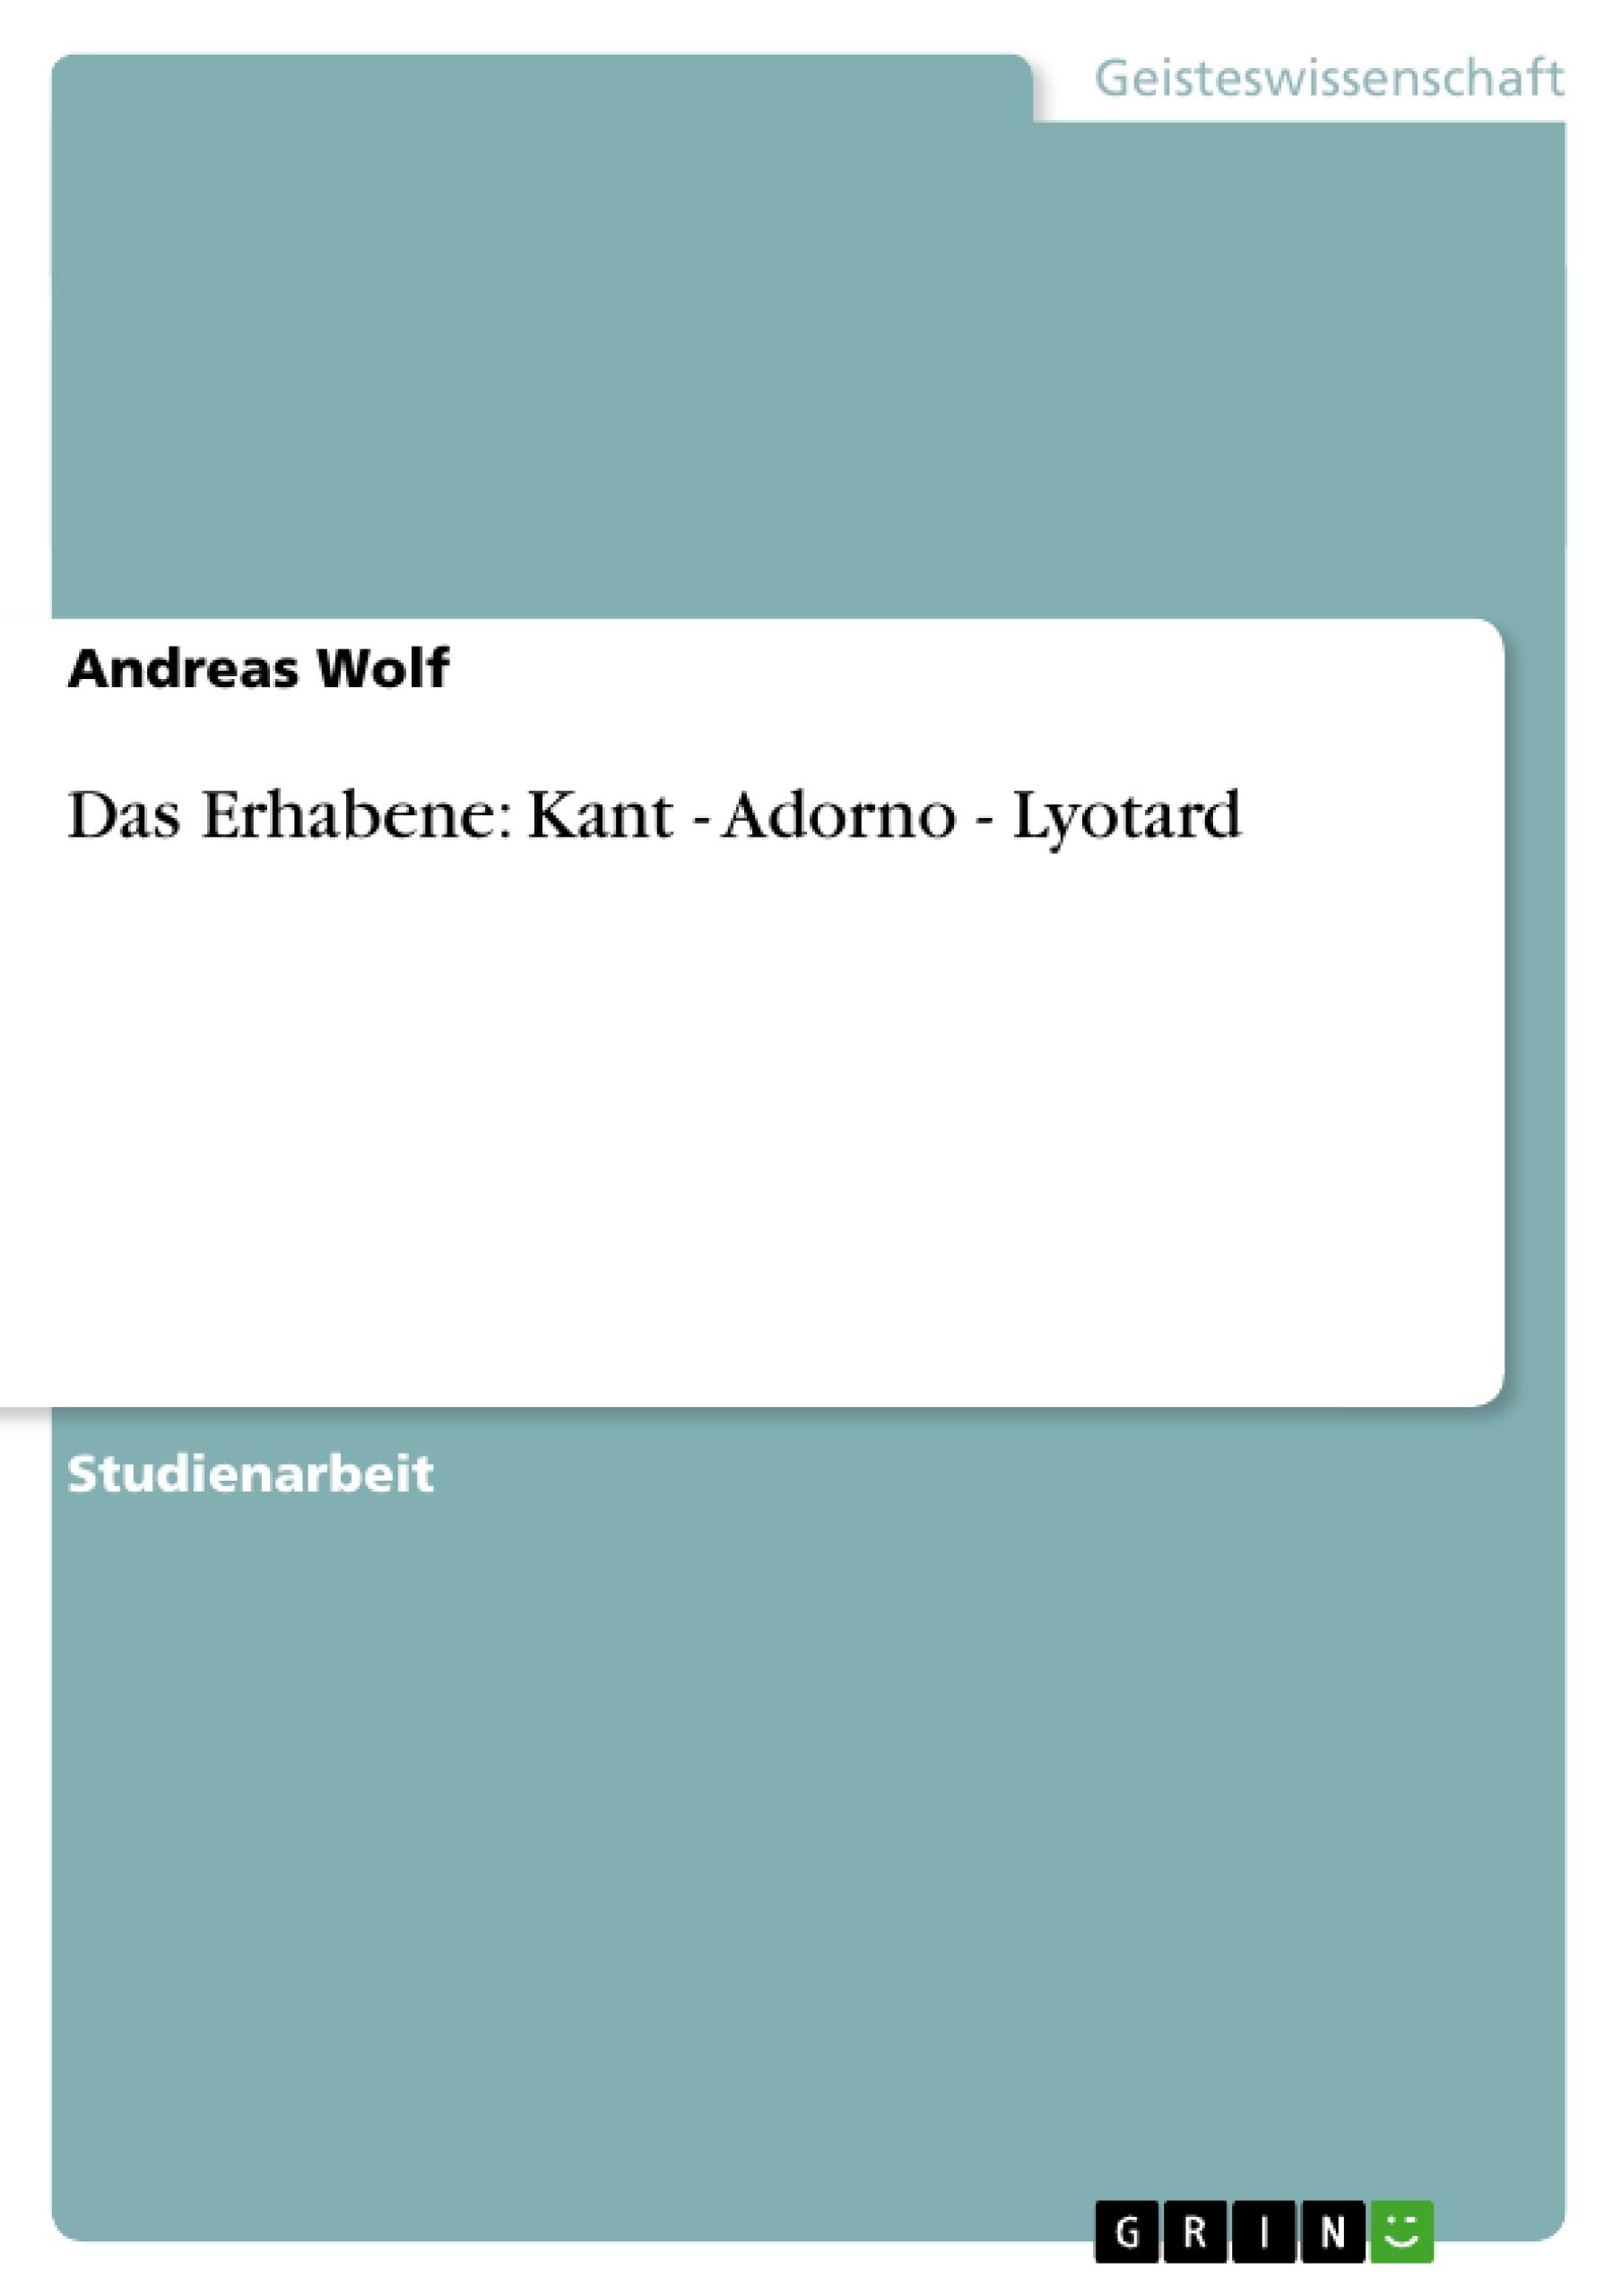 Titel: Das Erhabene: Kant - Adorno - Lyotard